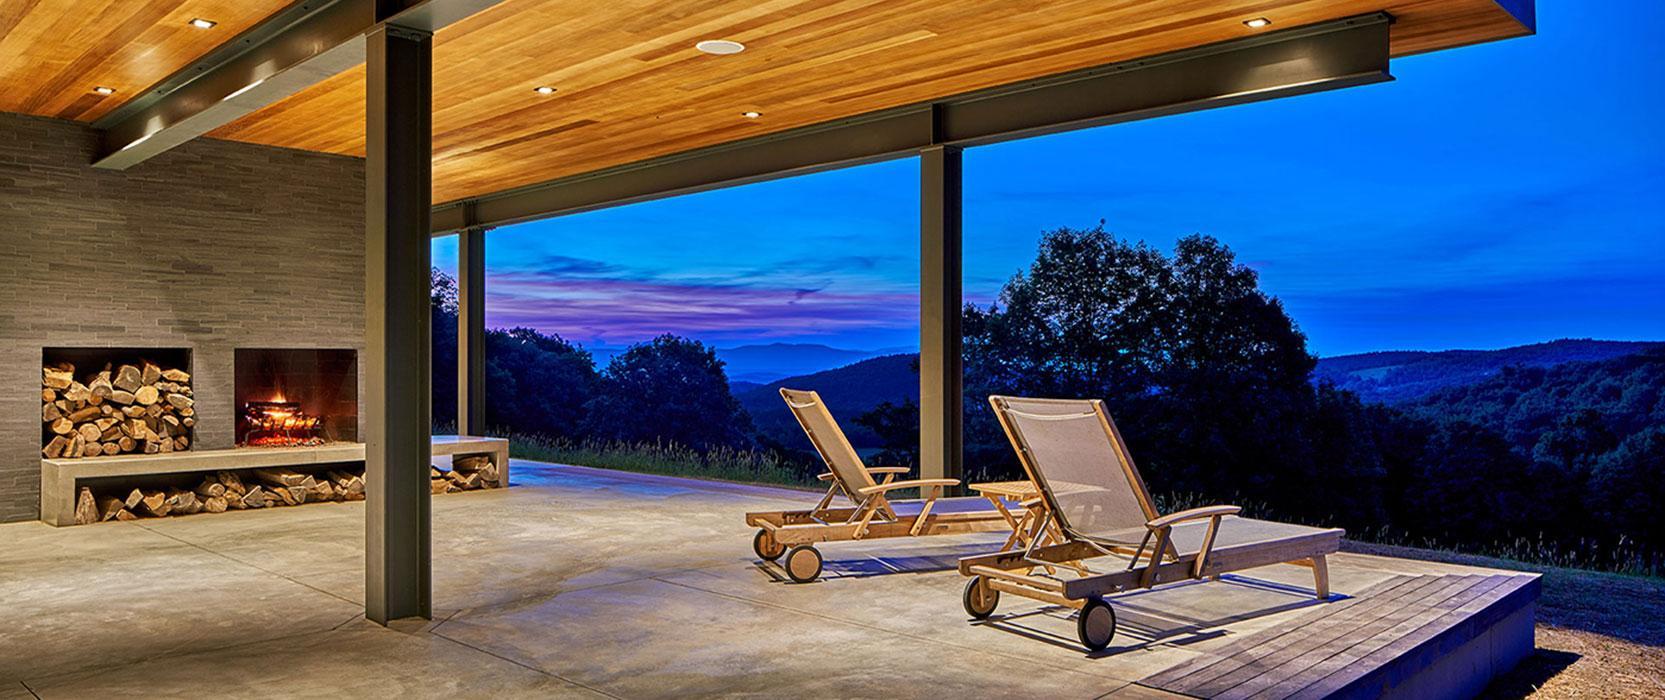 Cantilevered fireplace terrace by Matthew Cunningham Landscape Design